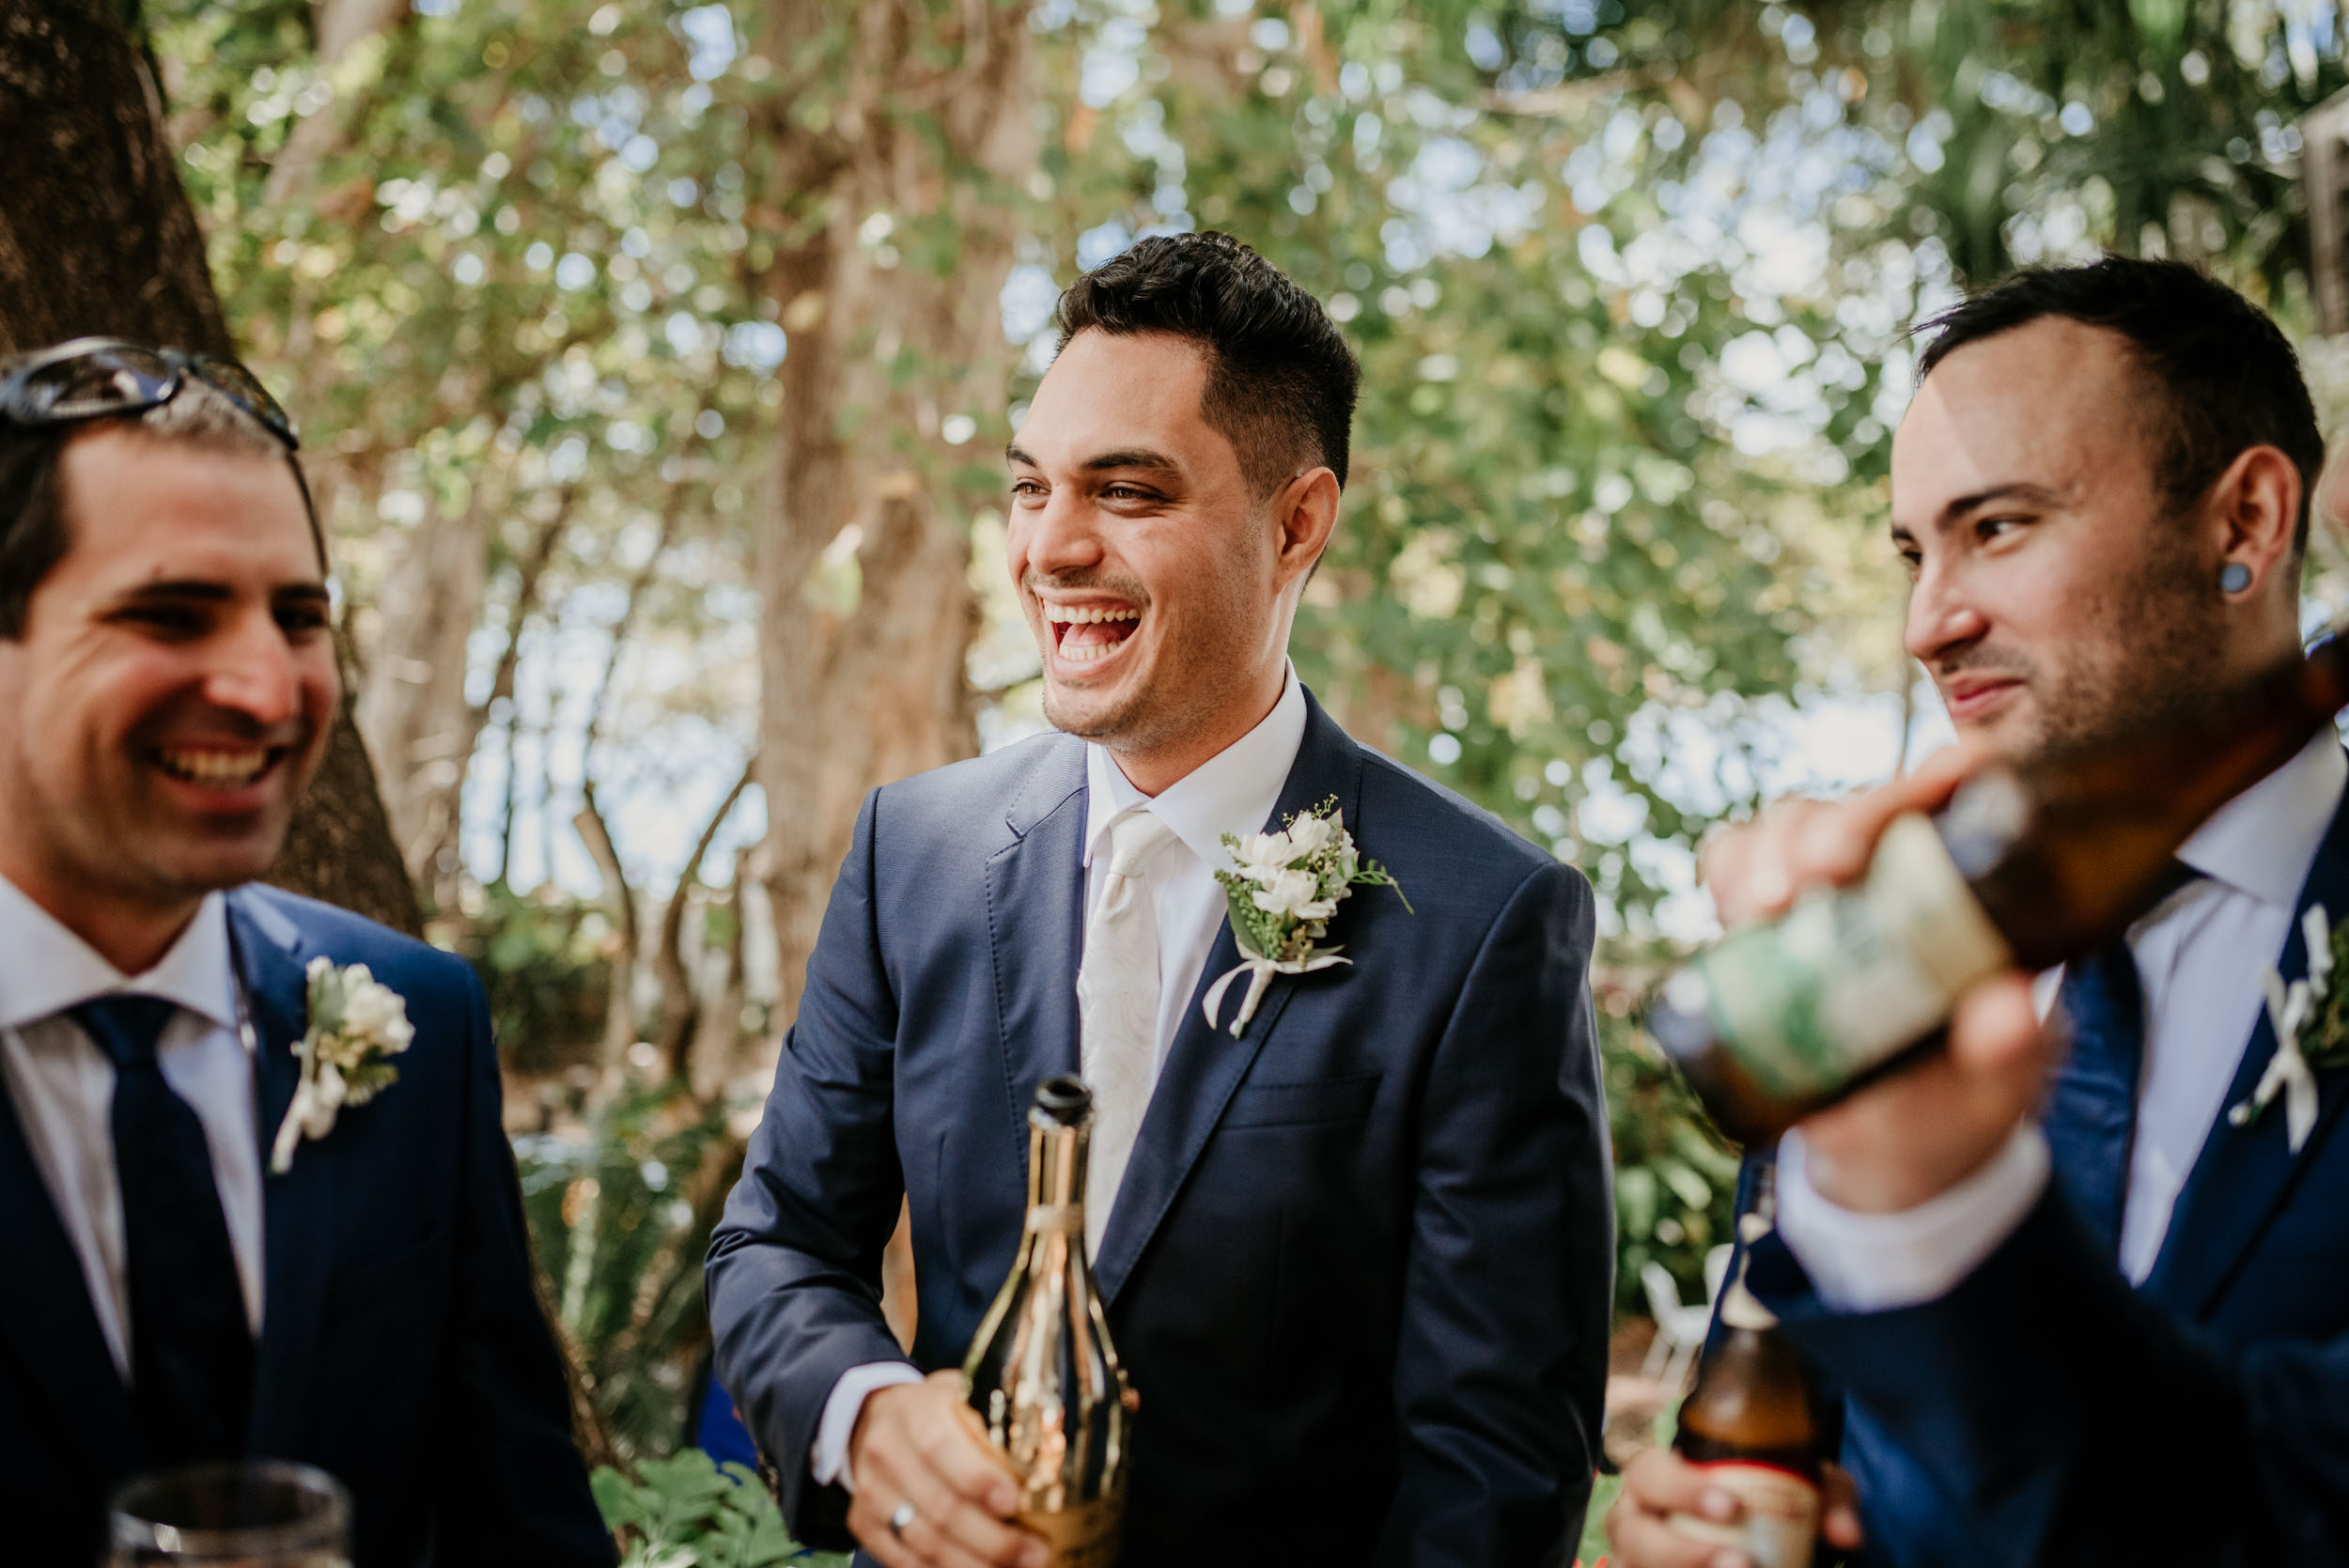 The Raw Photographer - Cairns Wedding Photographer - Beach Palm Cove Ceremony - Dress Irene Costa's Devine Bridal - Queensland-7.jpg